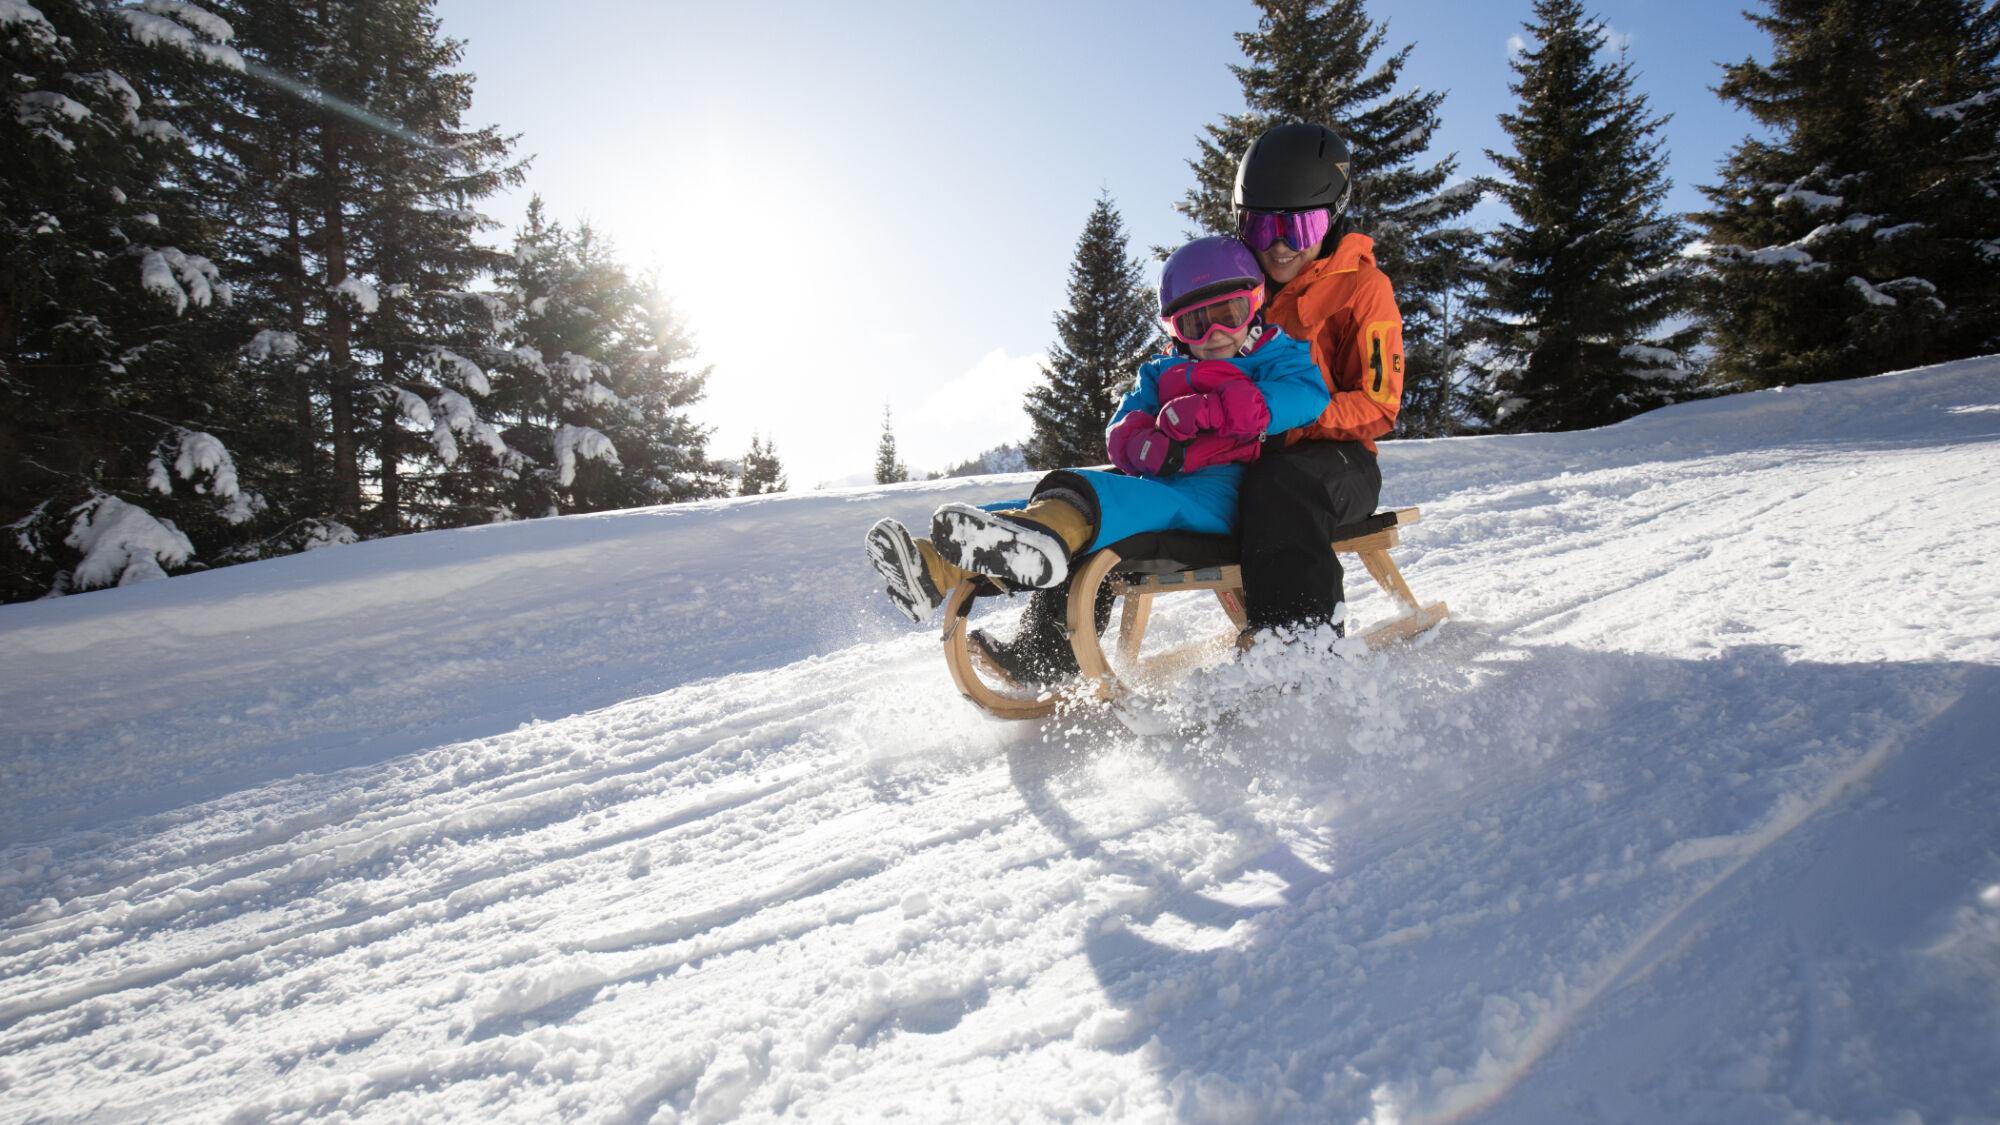 Winterspaß in Serfaus-Fiss-Ladis